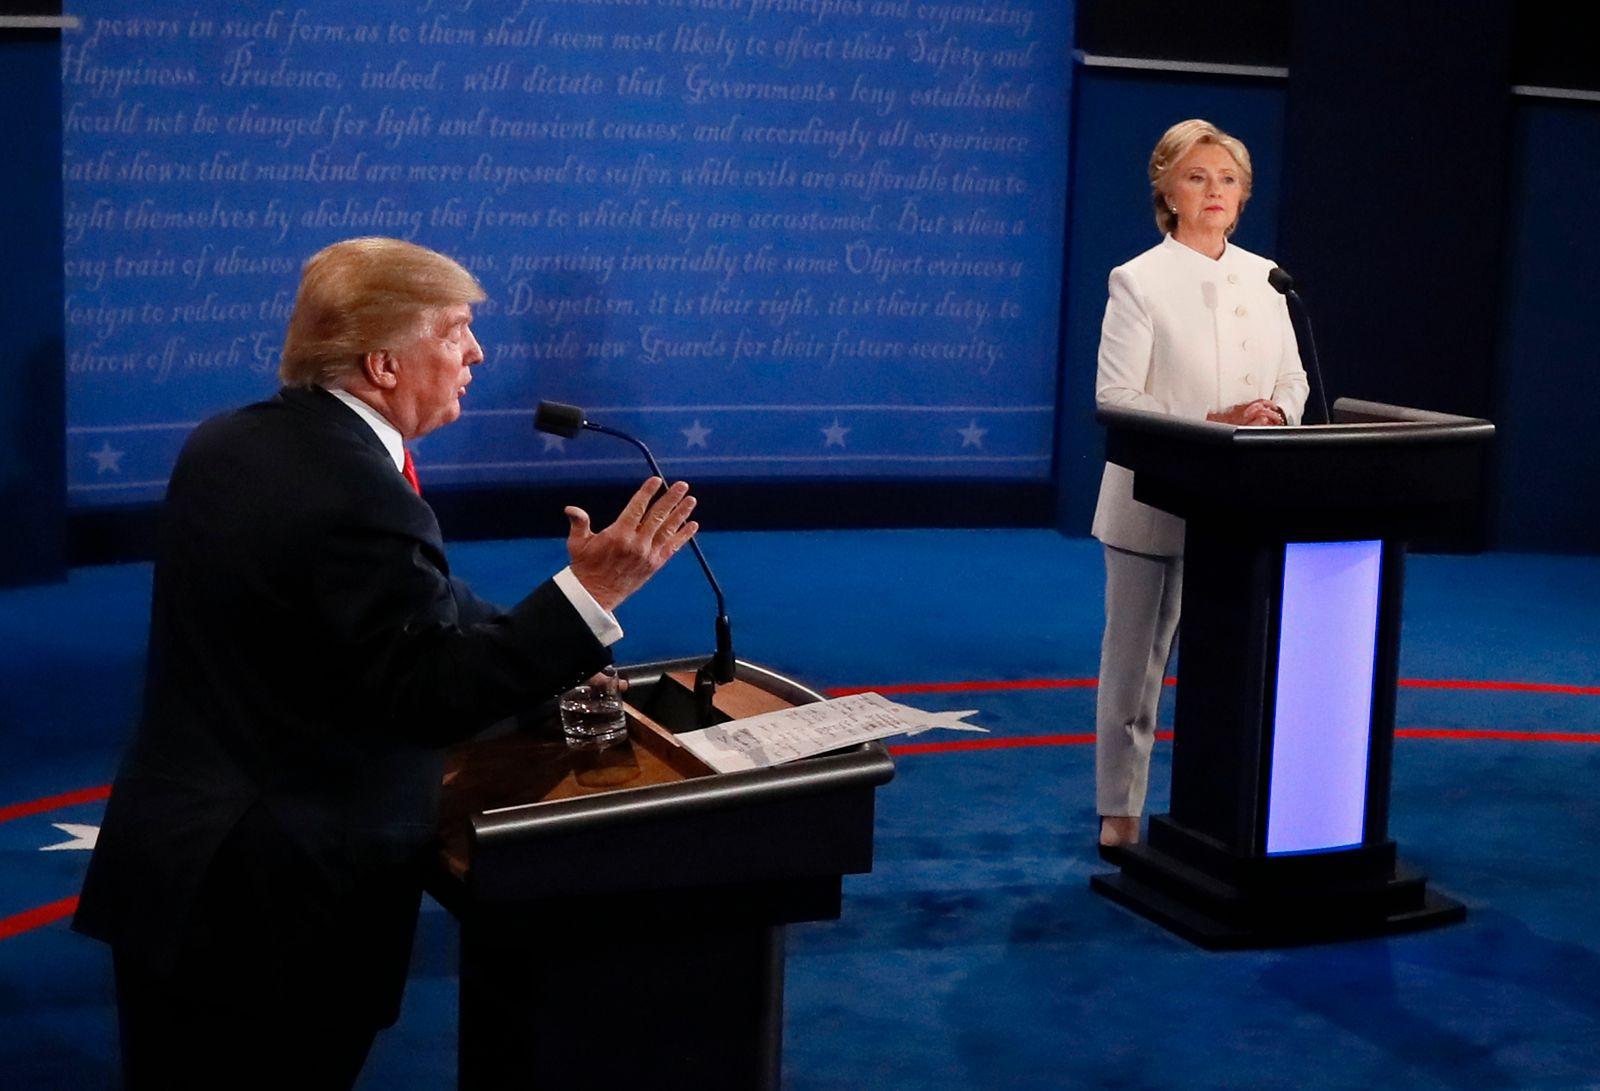 Final Presidential Debate Between Hillary Clinton and Donald Trump